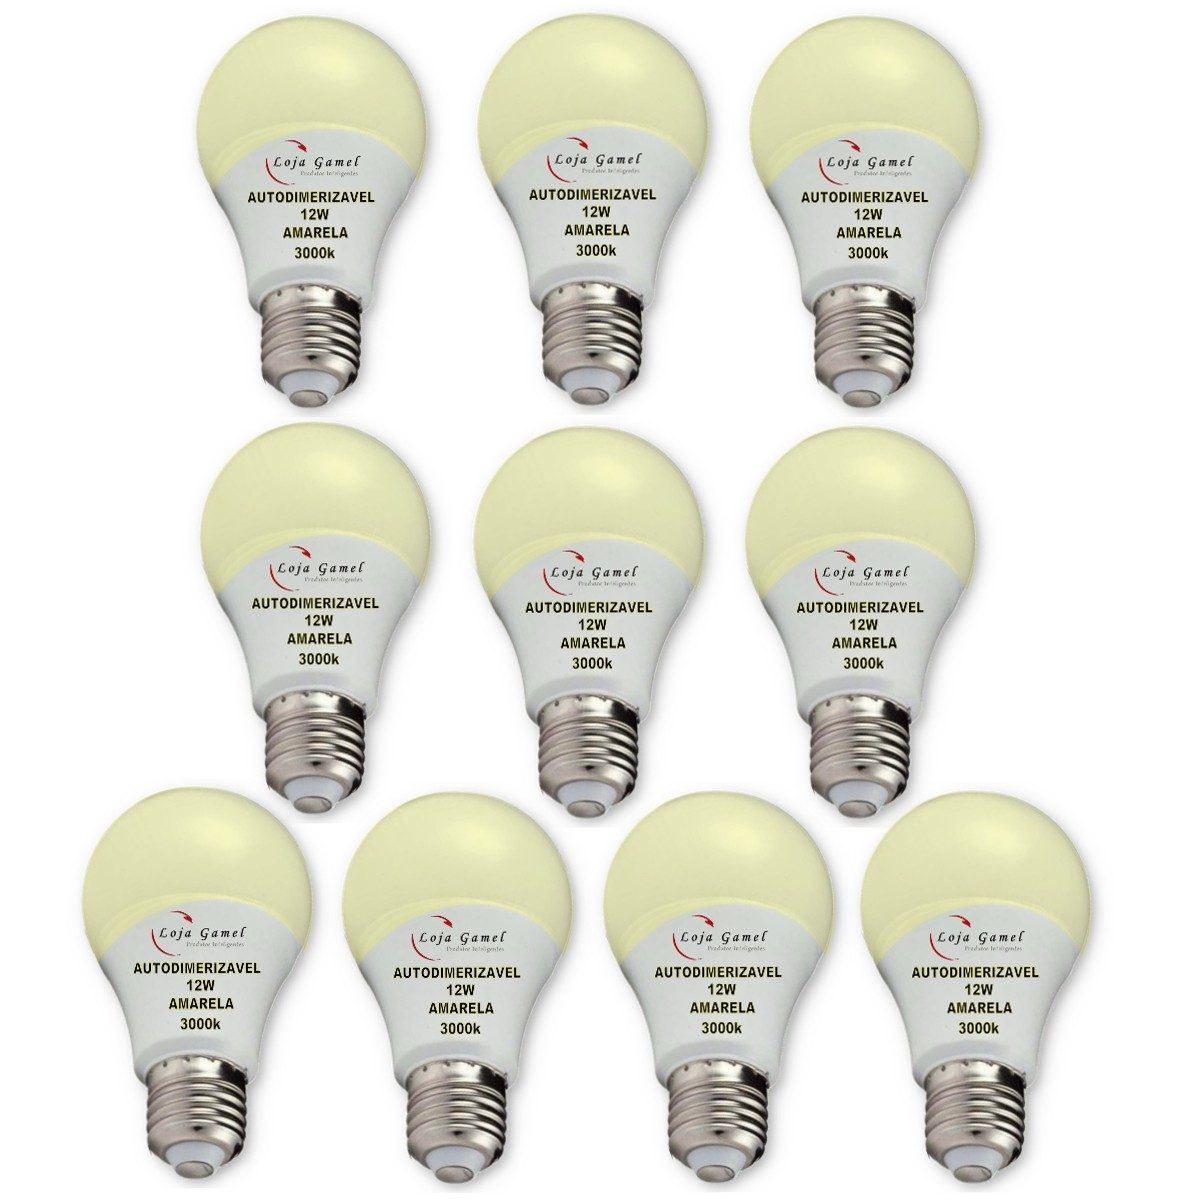 Foto 1 - Lâmpada LED Bulbo Autodimerizável 12W Luz Amarela 3000K 10un